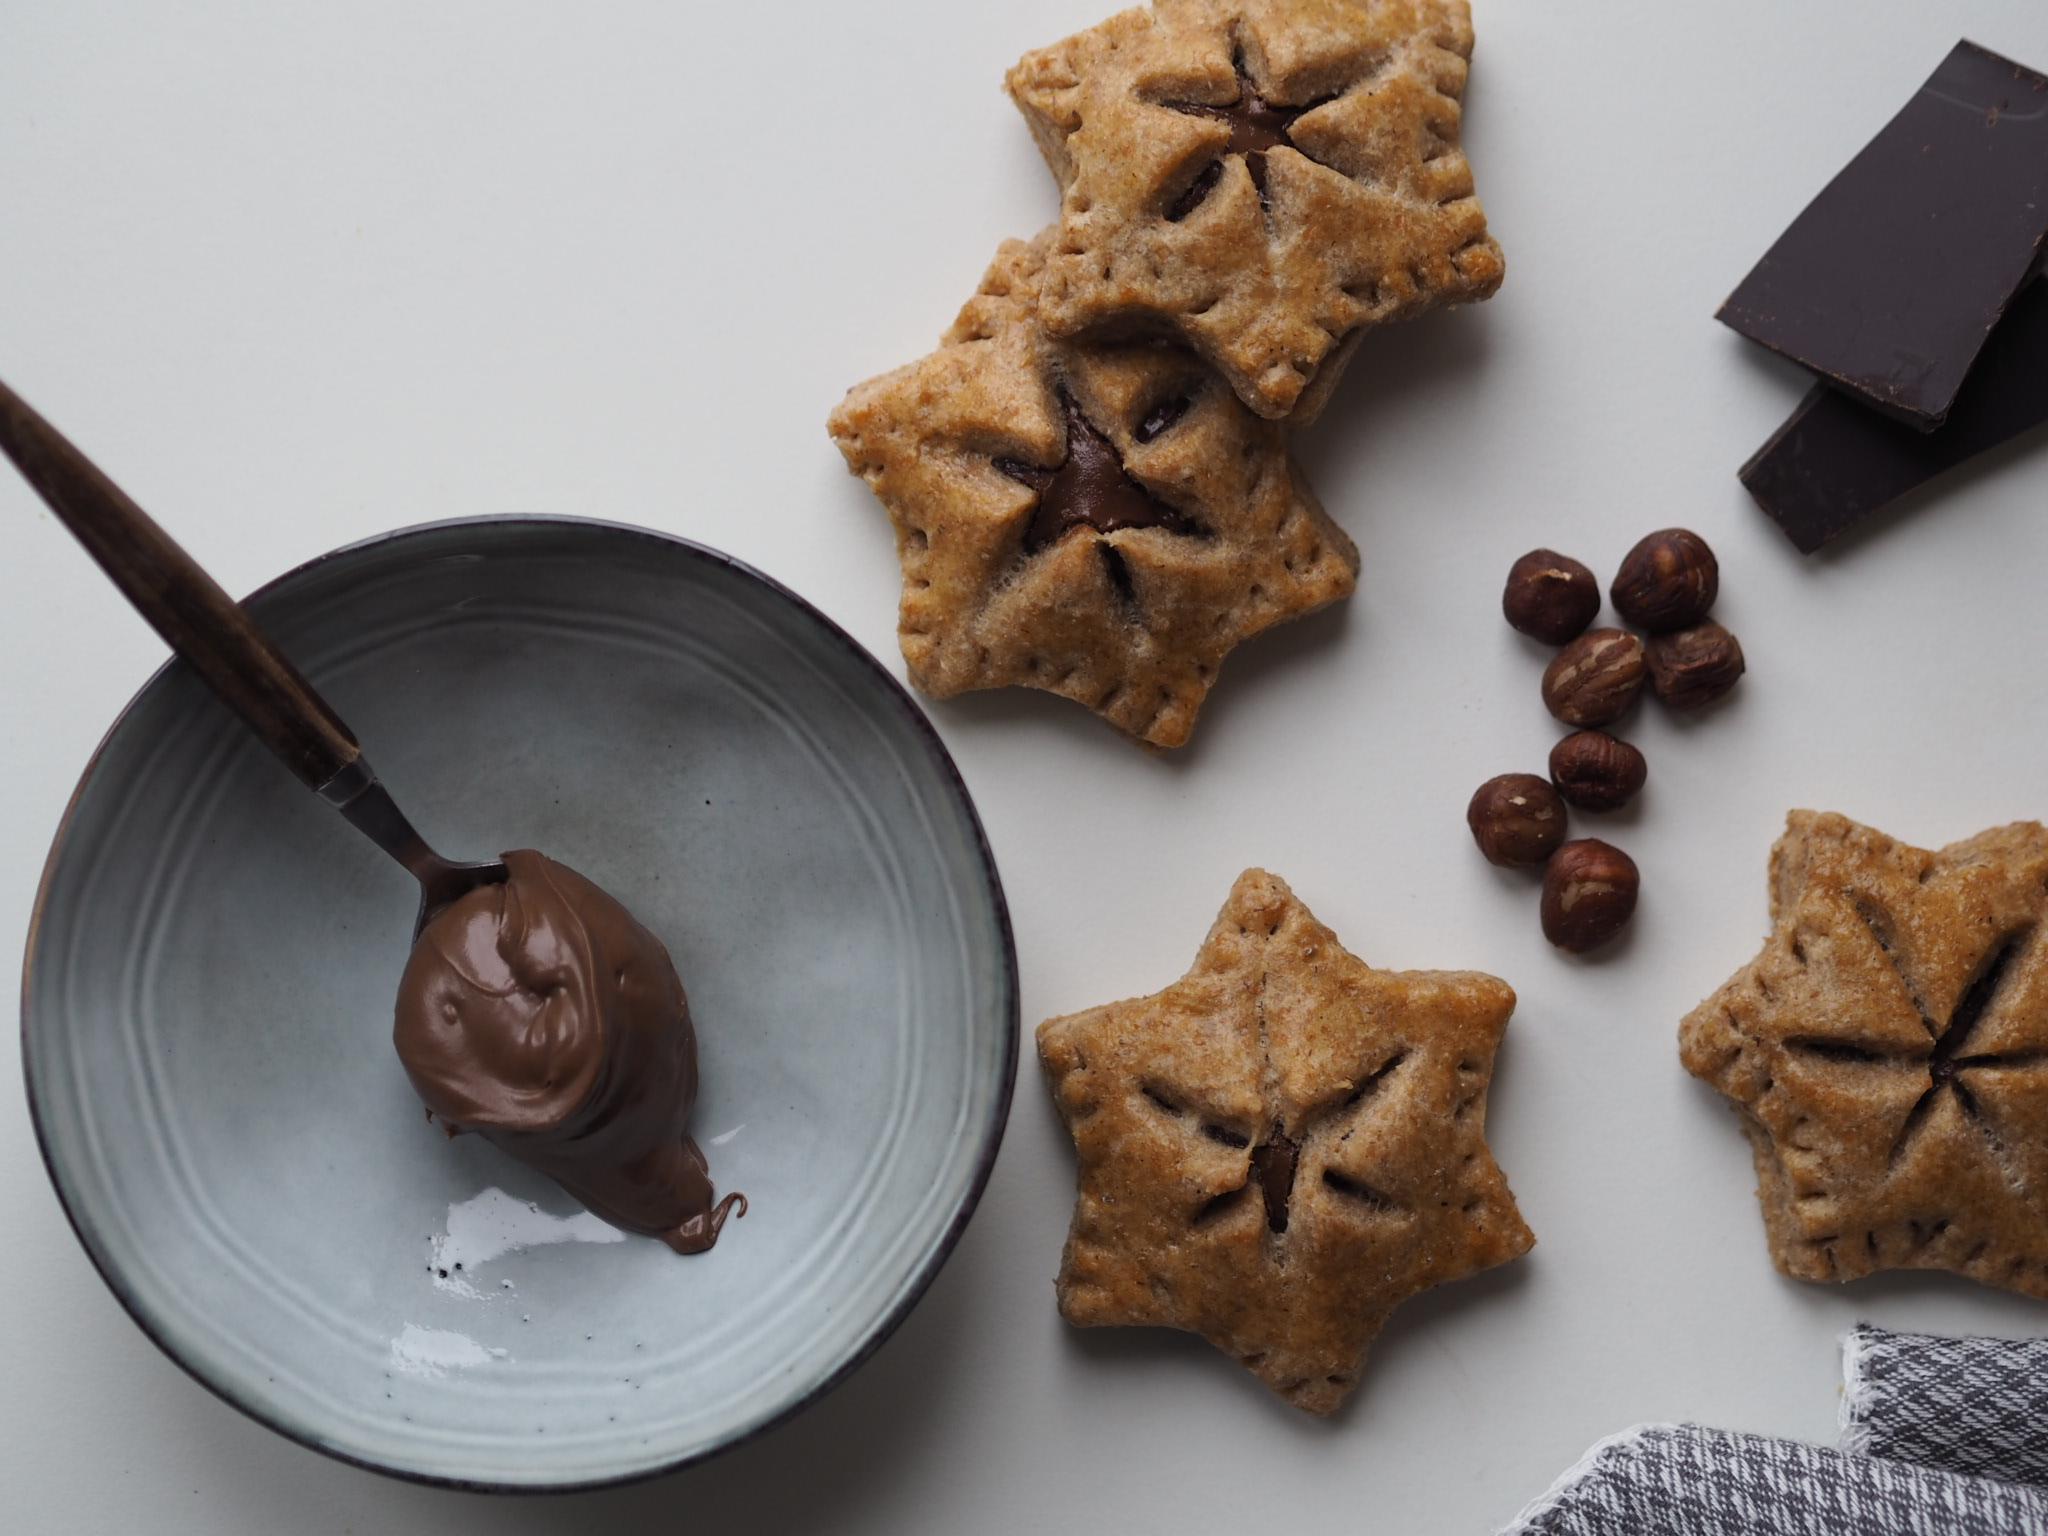 Stjernetærter fyldt med chokonøddecreme